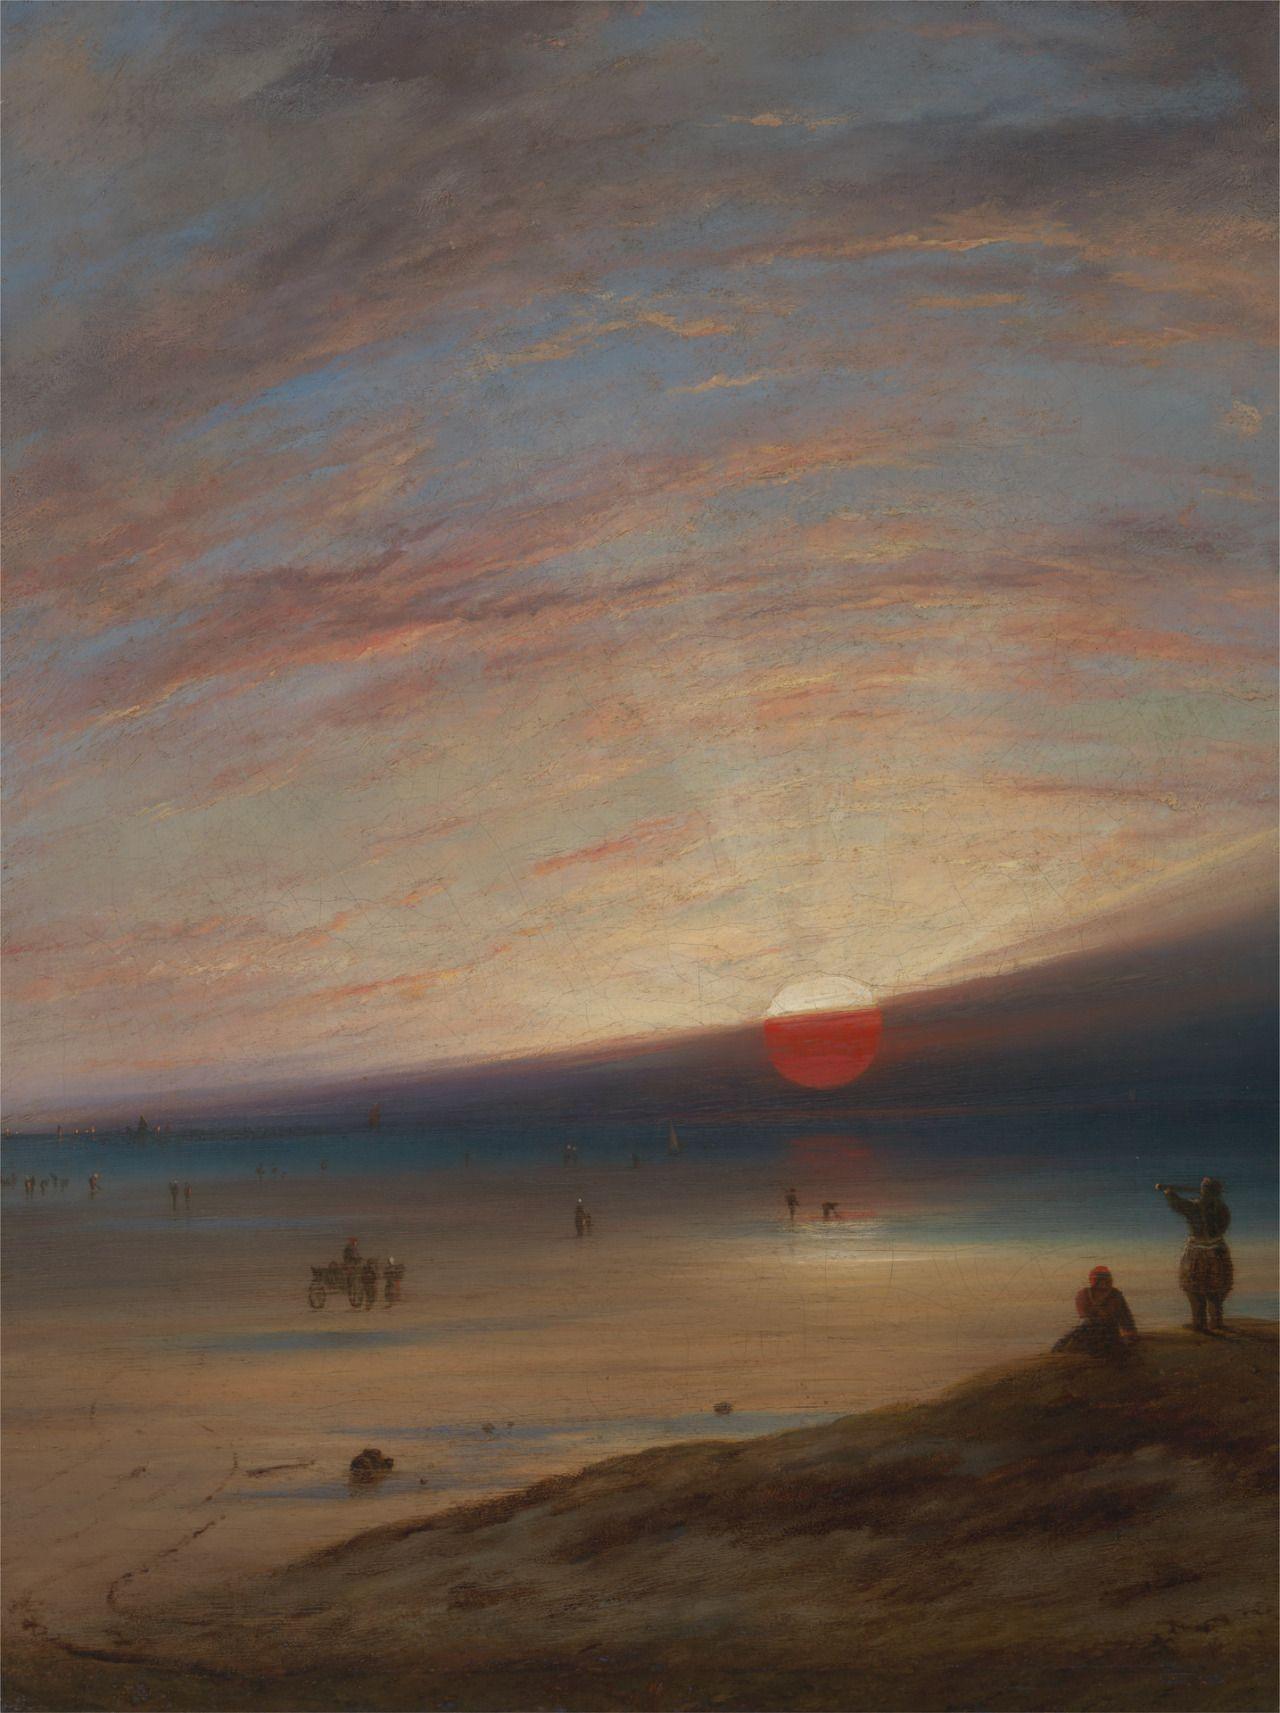 Sunset on the Beach at Sark, ca 1850,  Unknown 19th century Painter. - Oil on Canvas -